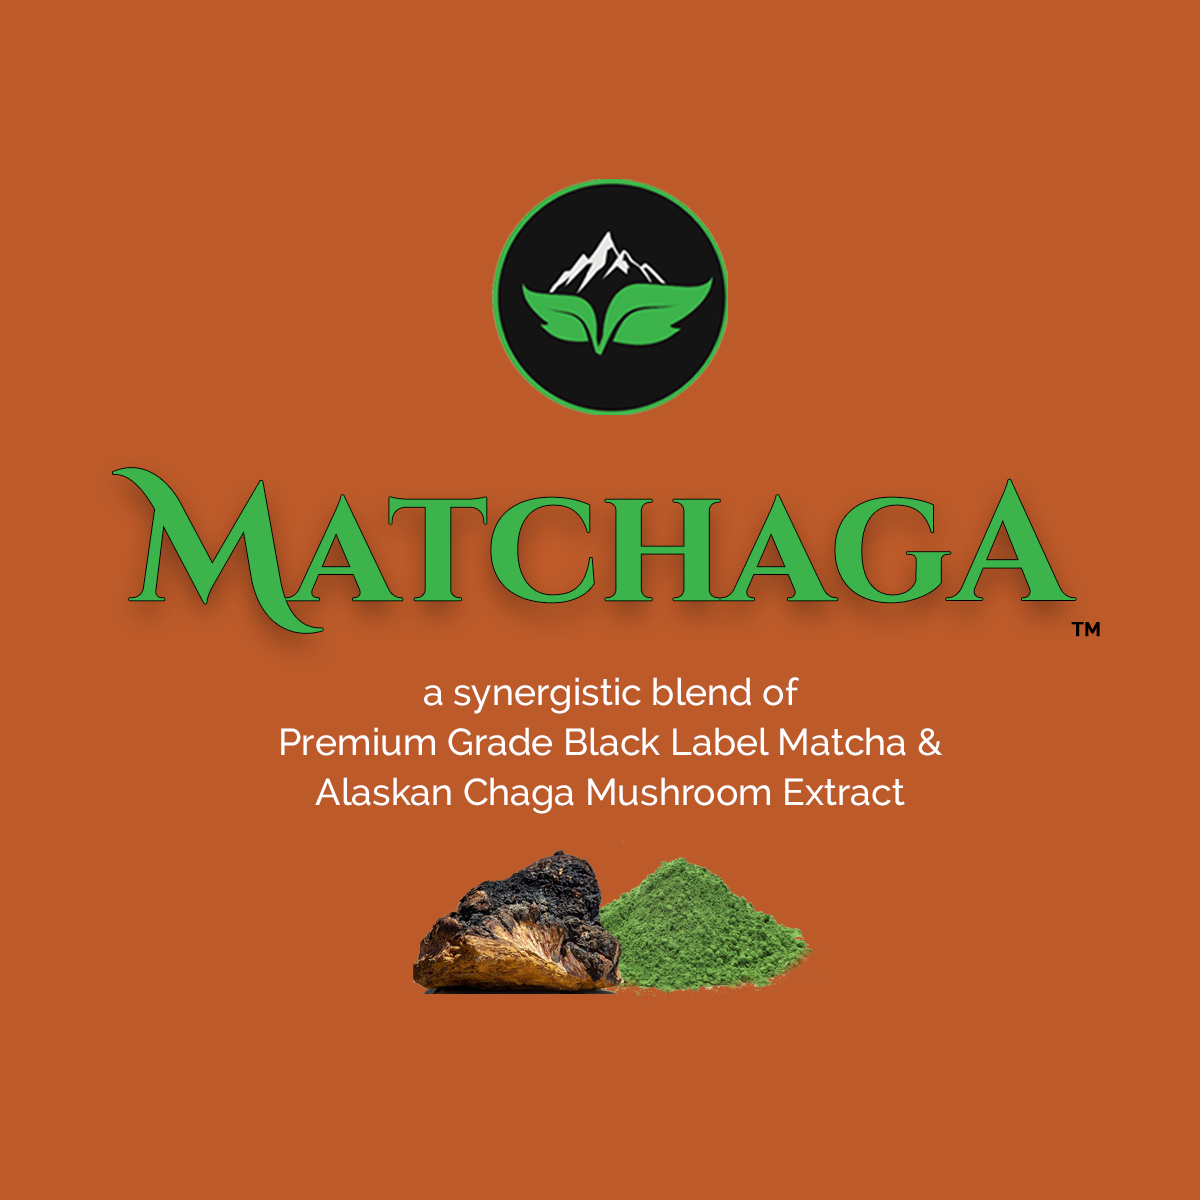 matchagarev5.png